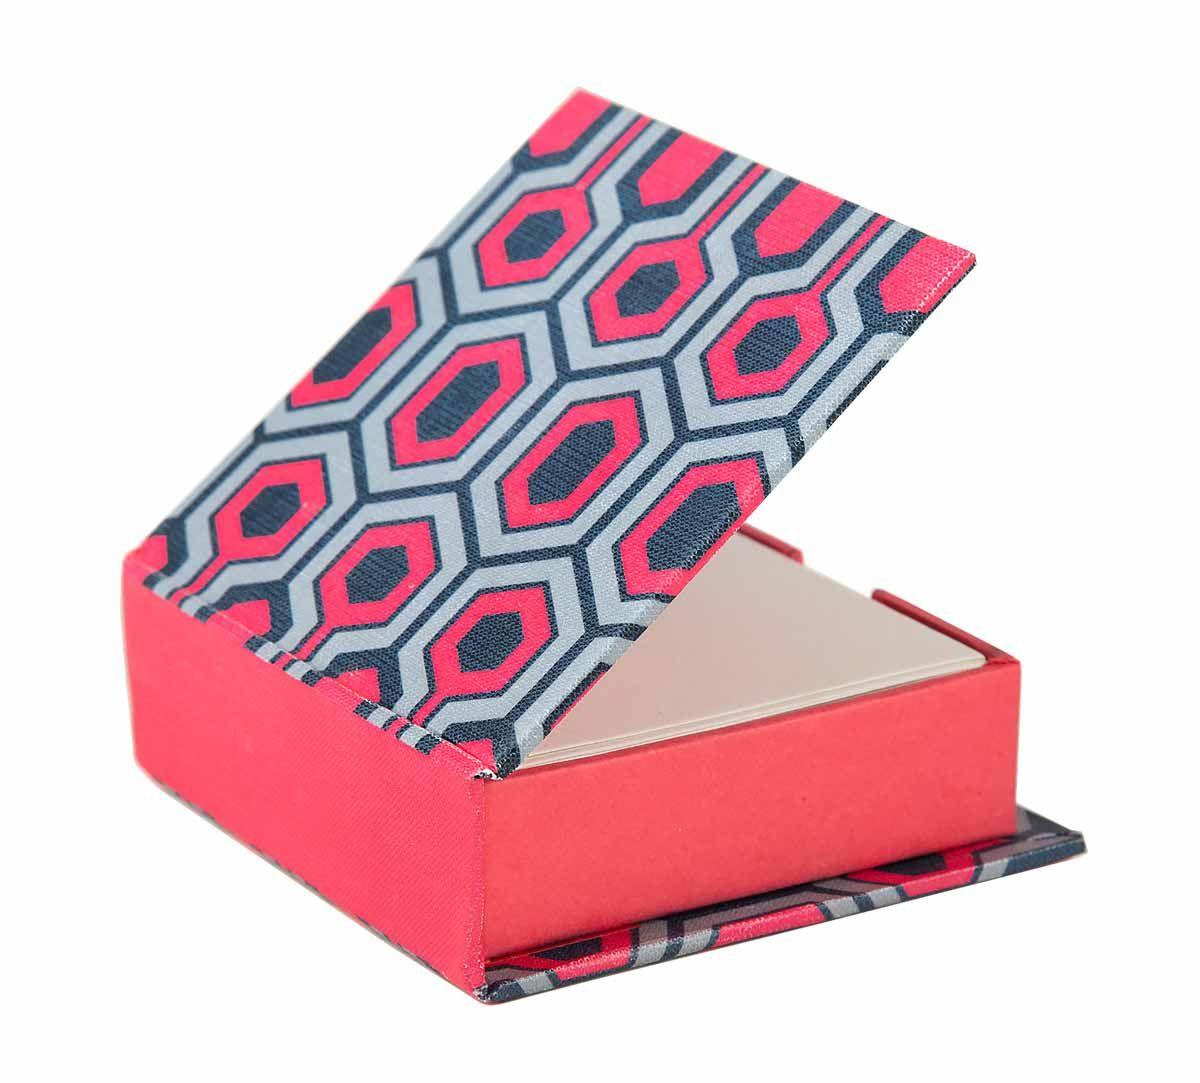 India Circus Prismatic Hexagons Memo Pad Box